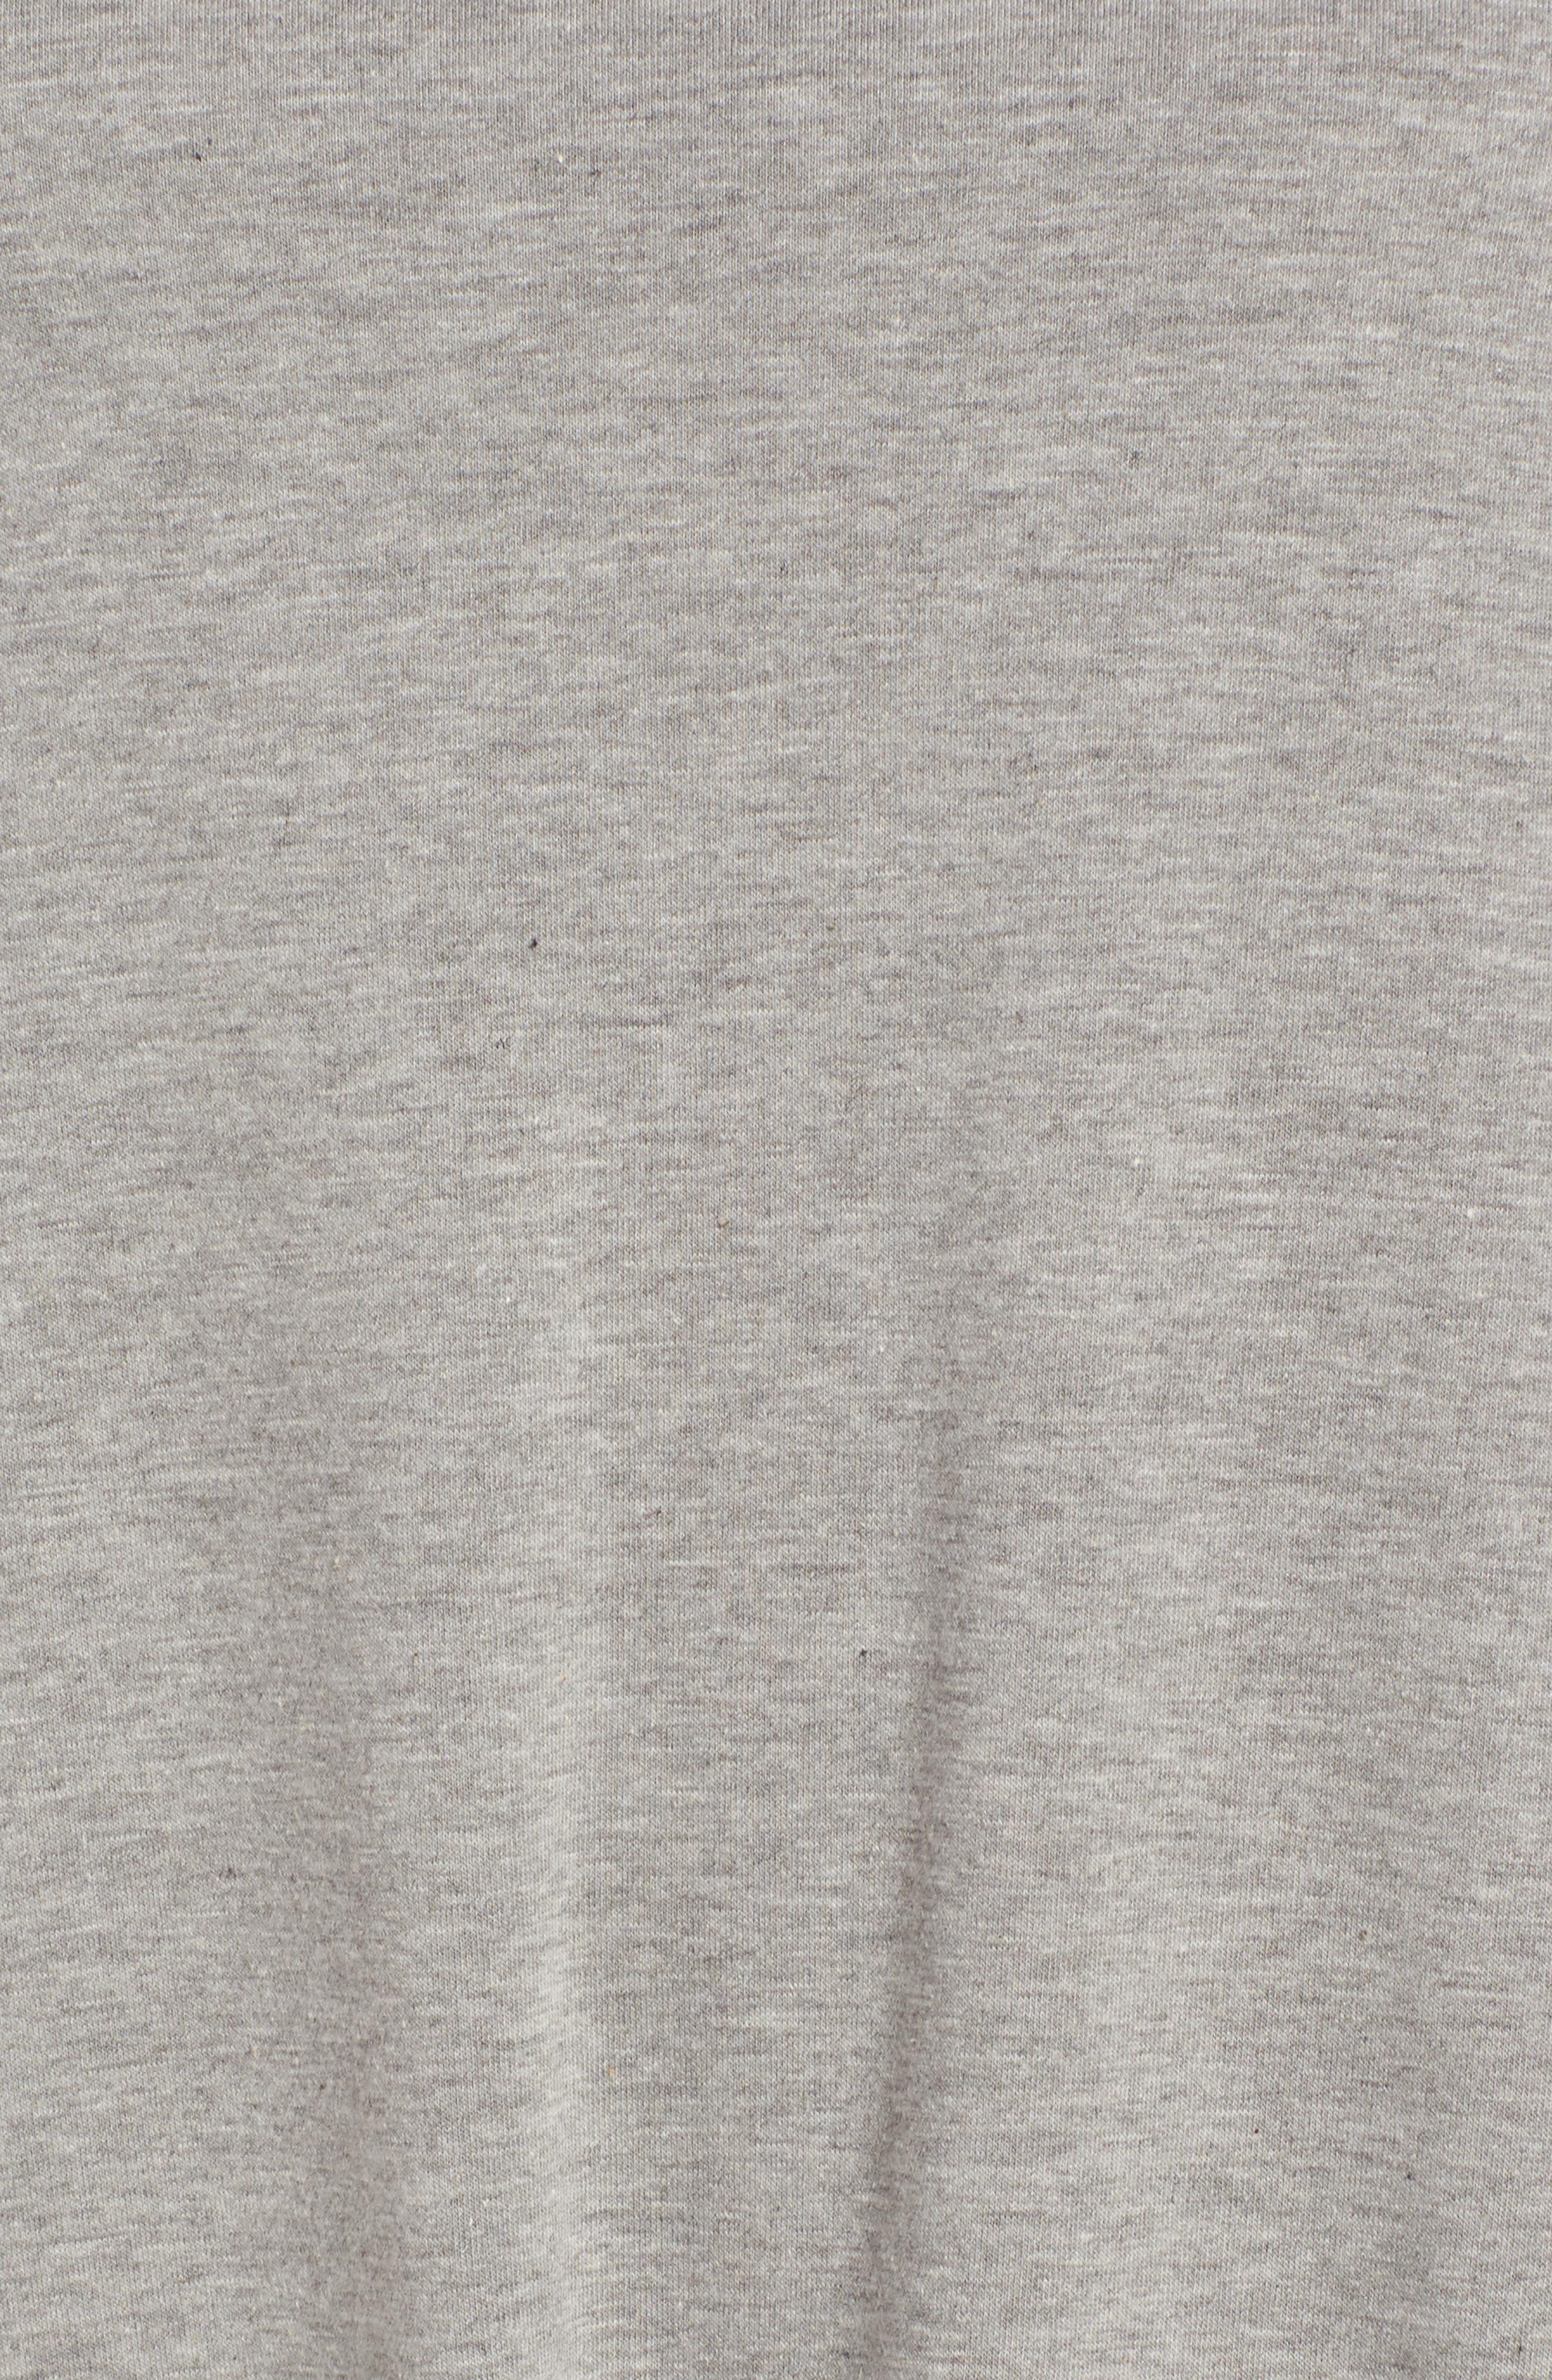 Alternate Image 5  - Cotton Emporium Ruffle Hem Knit T-Shirt Dress